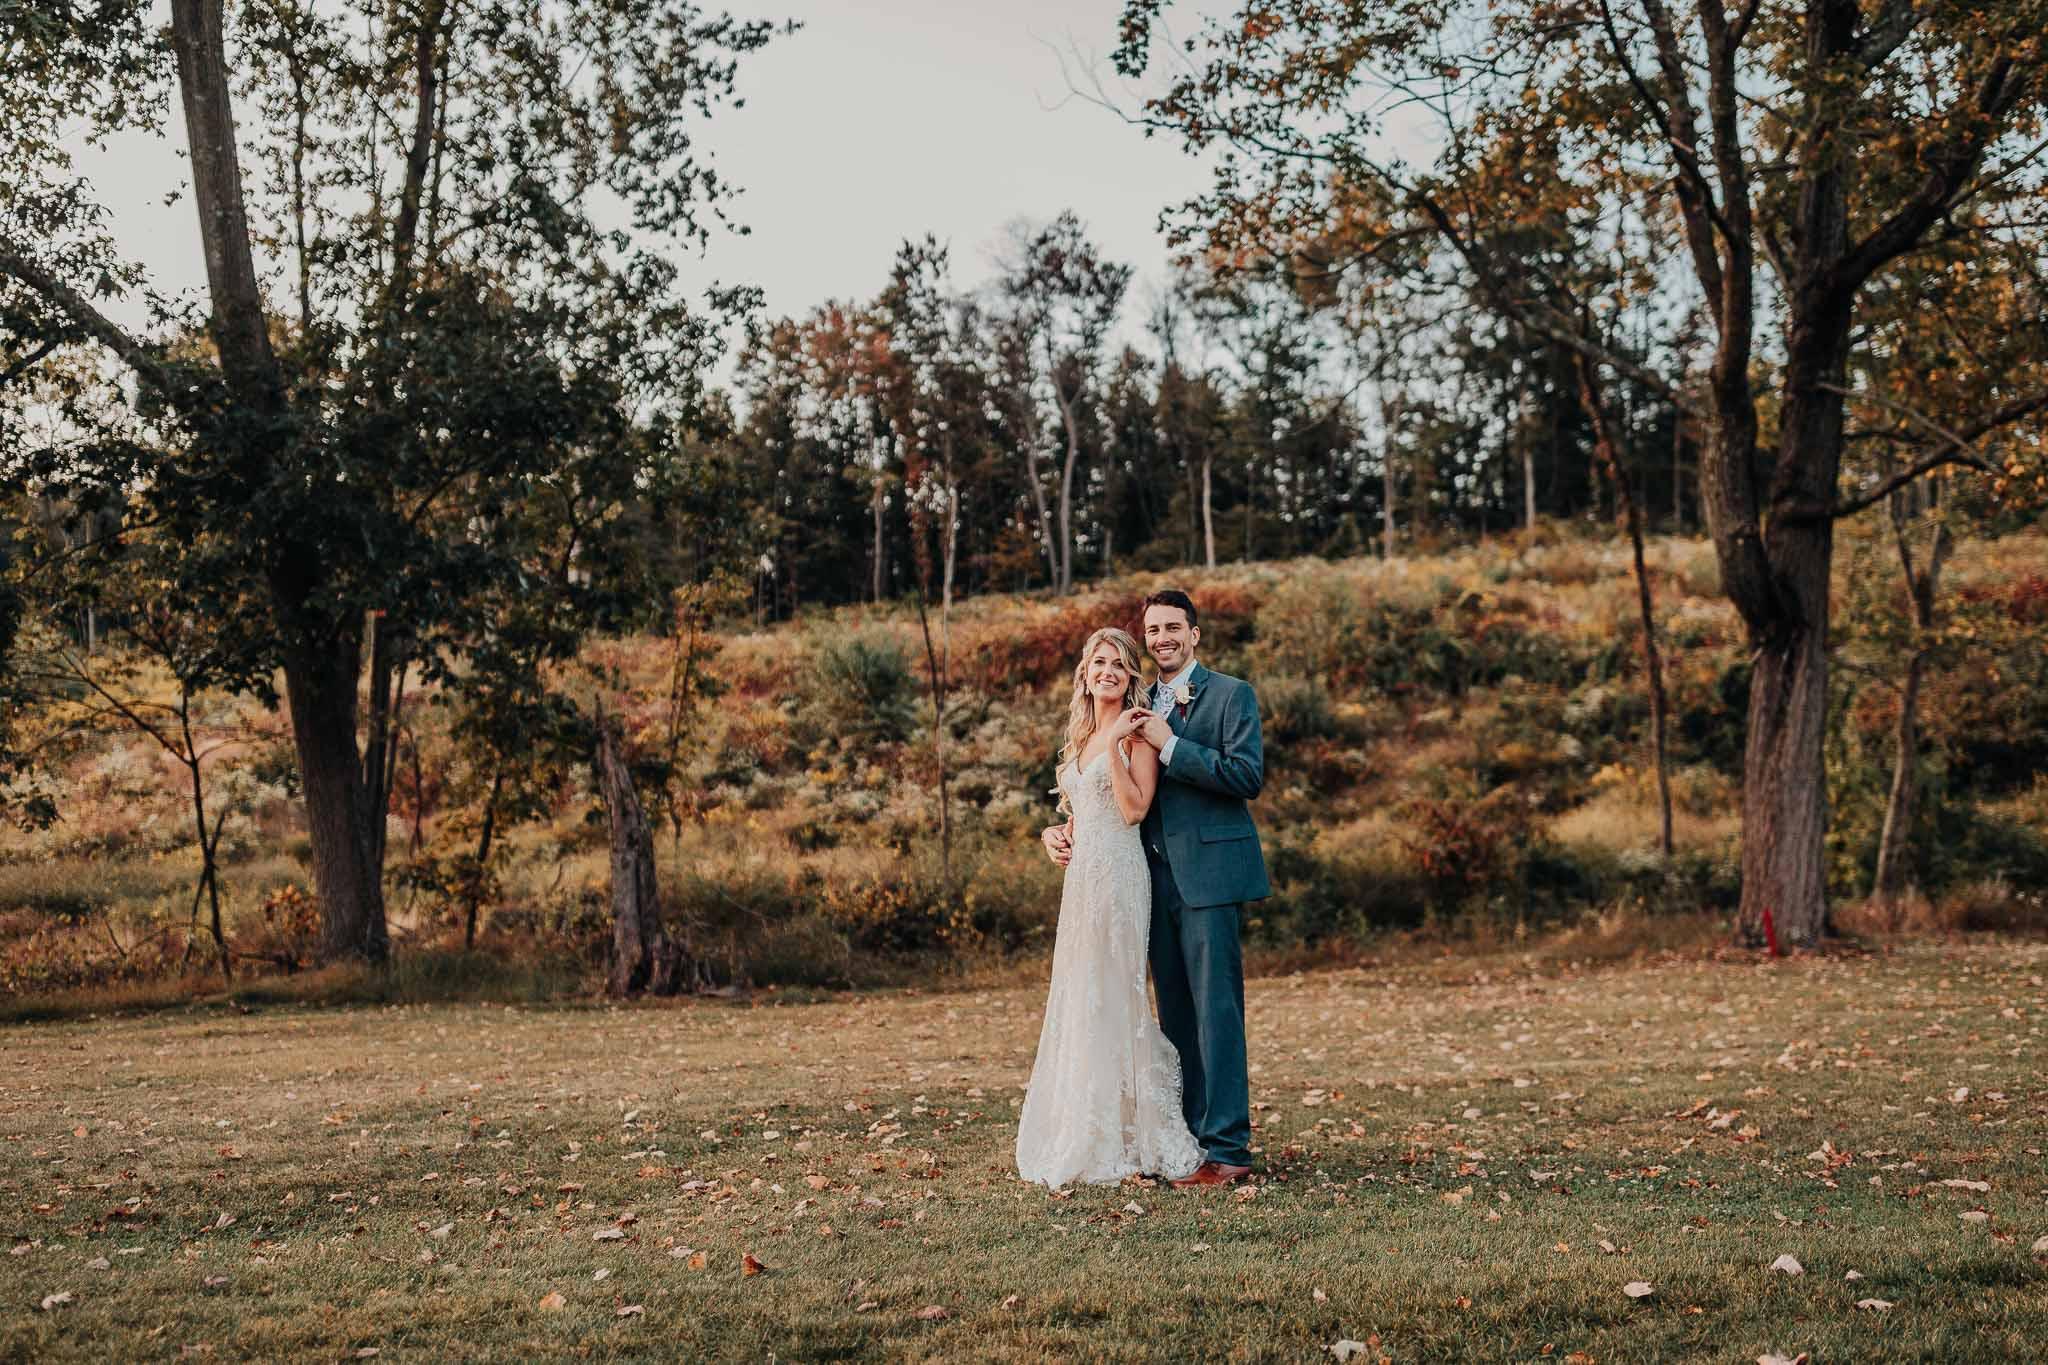 Frosty-Valley-September-Wedding-8207.jpg